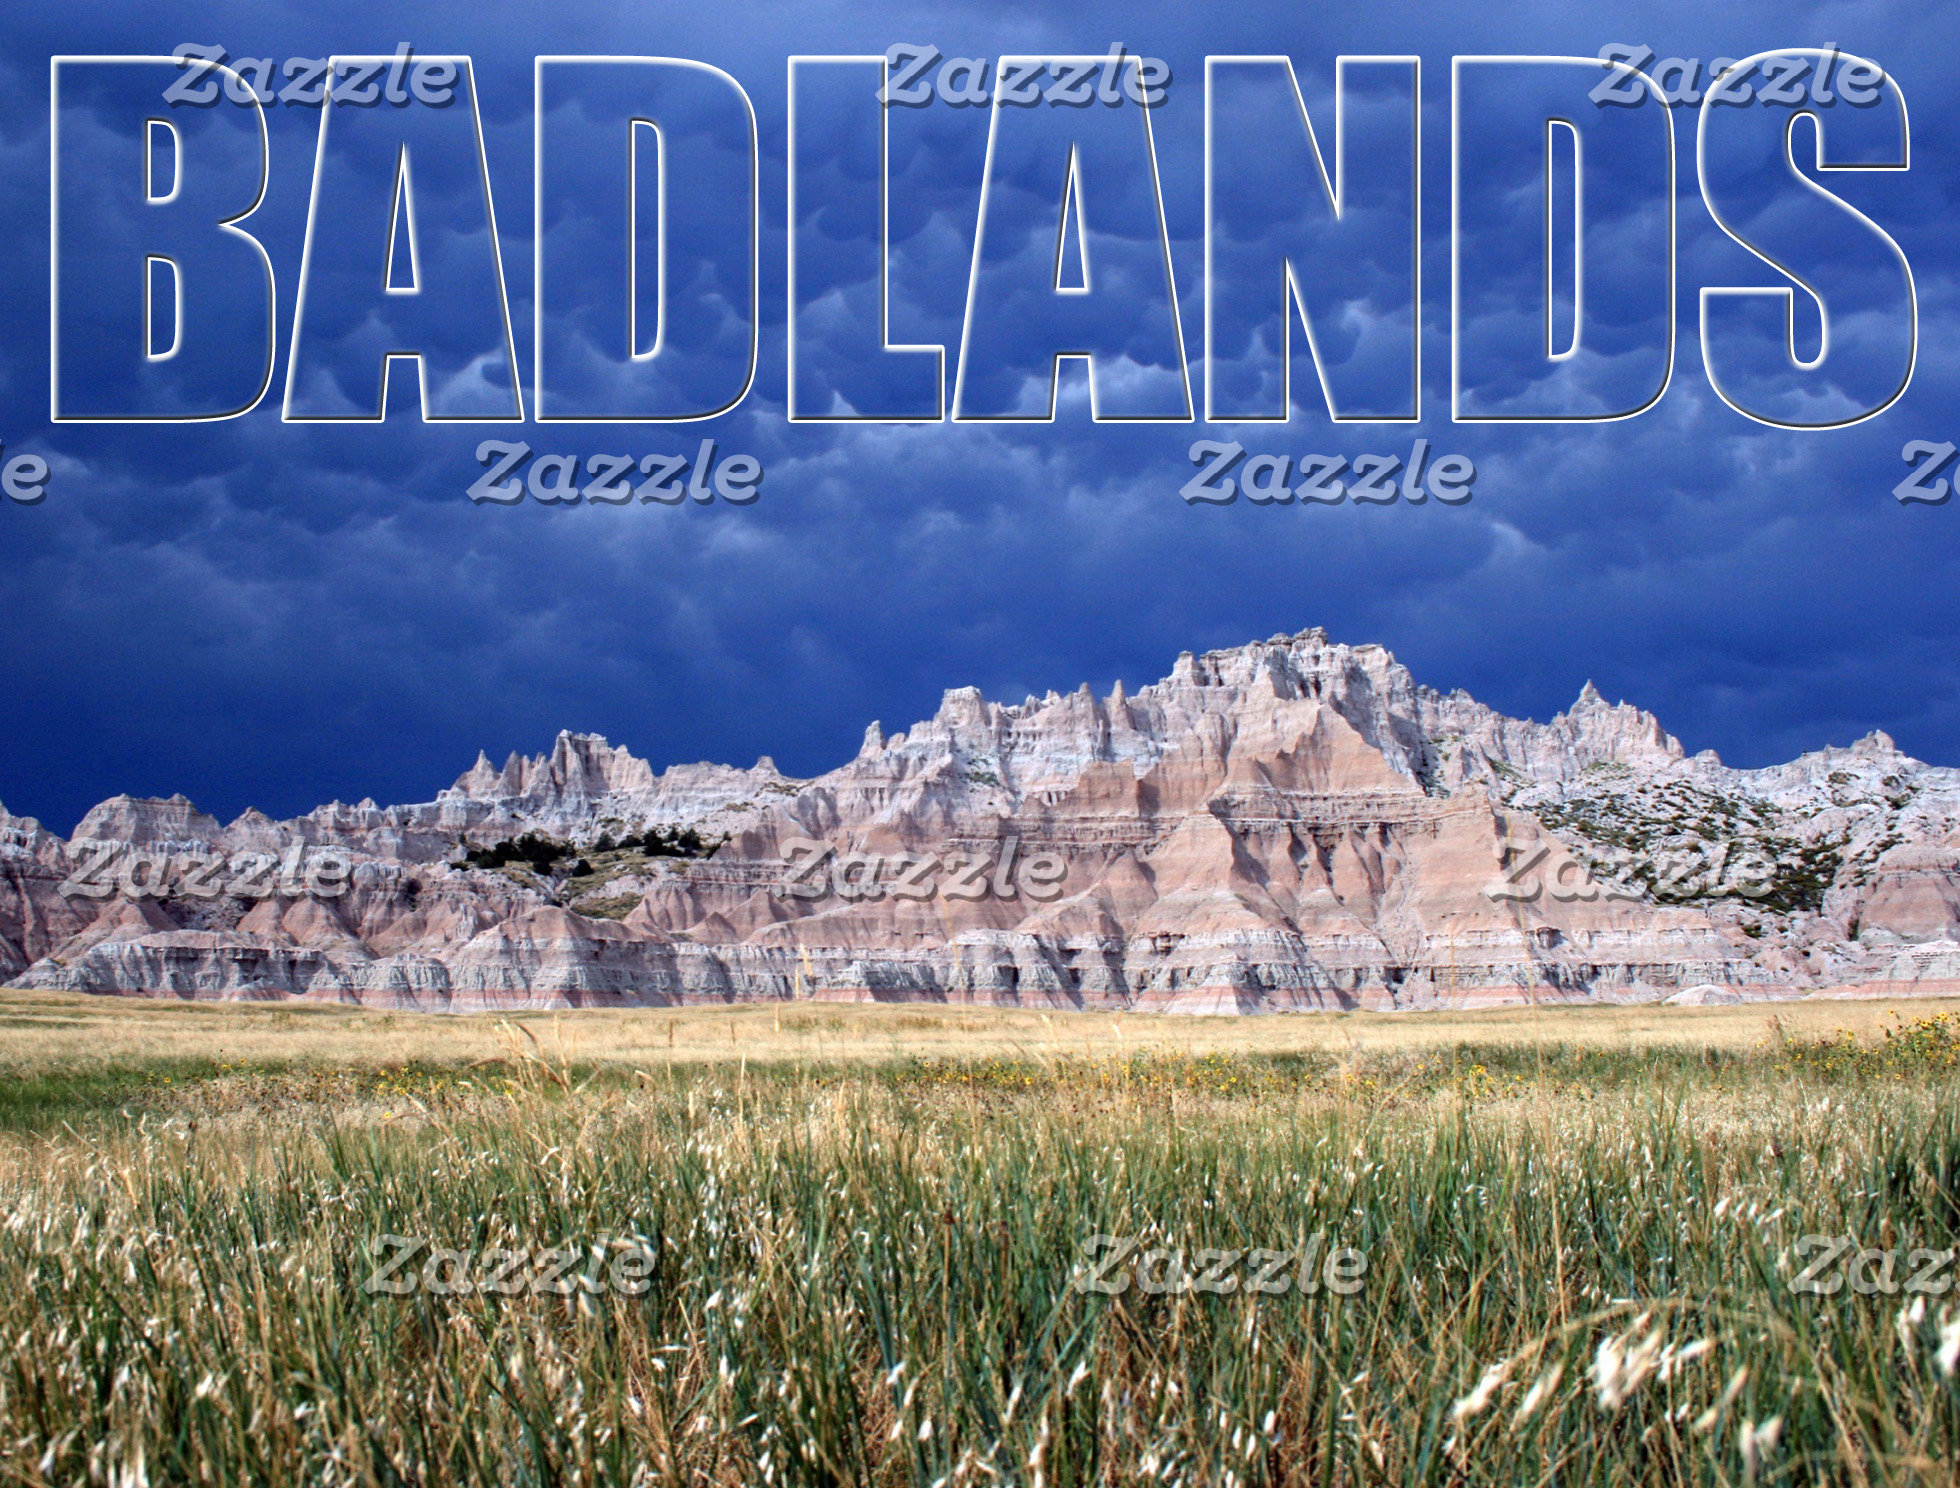 Badlands, South Dakota (USA)